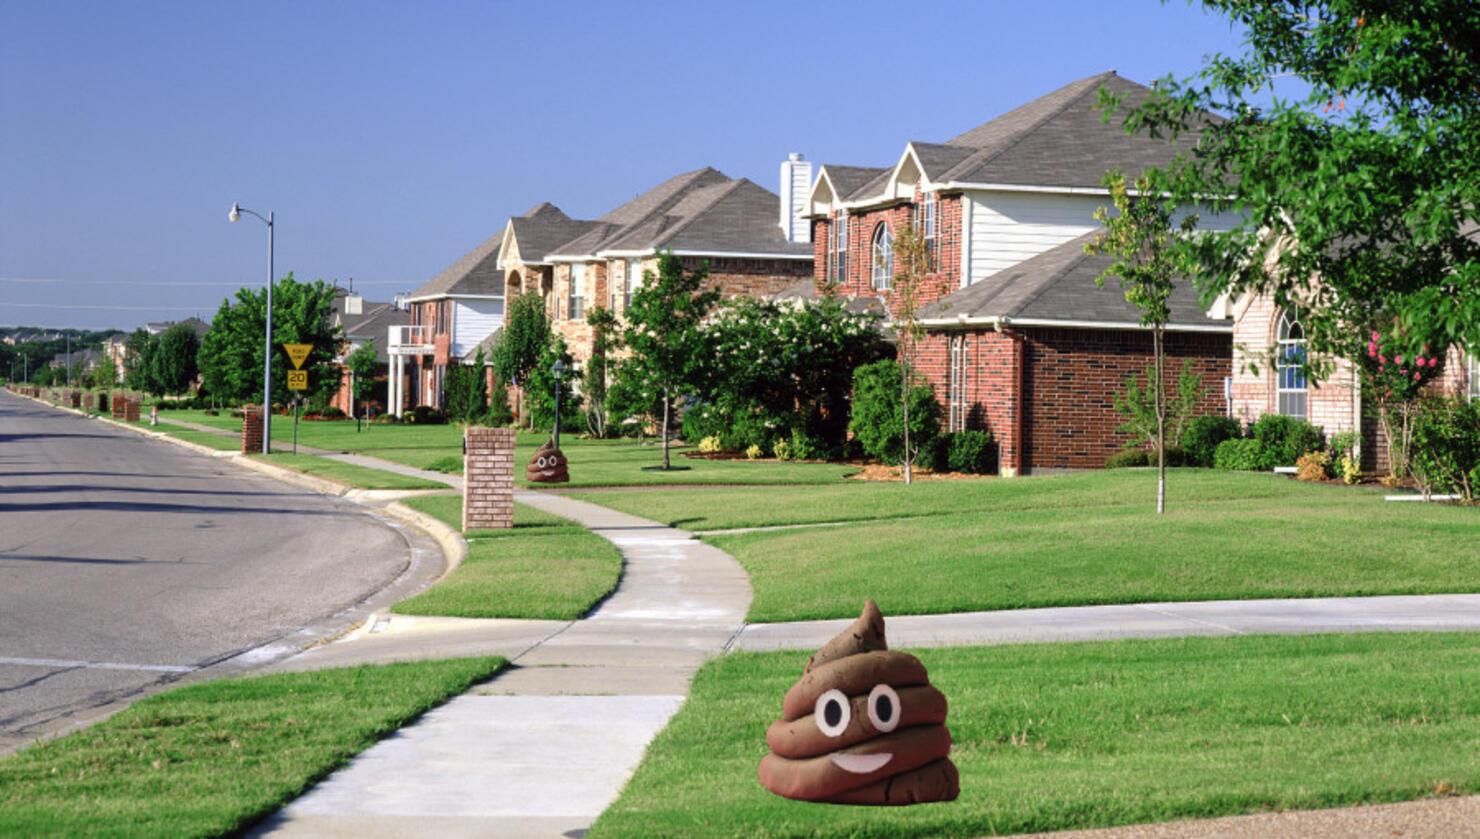 Smiling poop emoji on a front lawn.